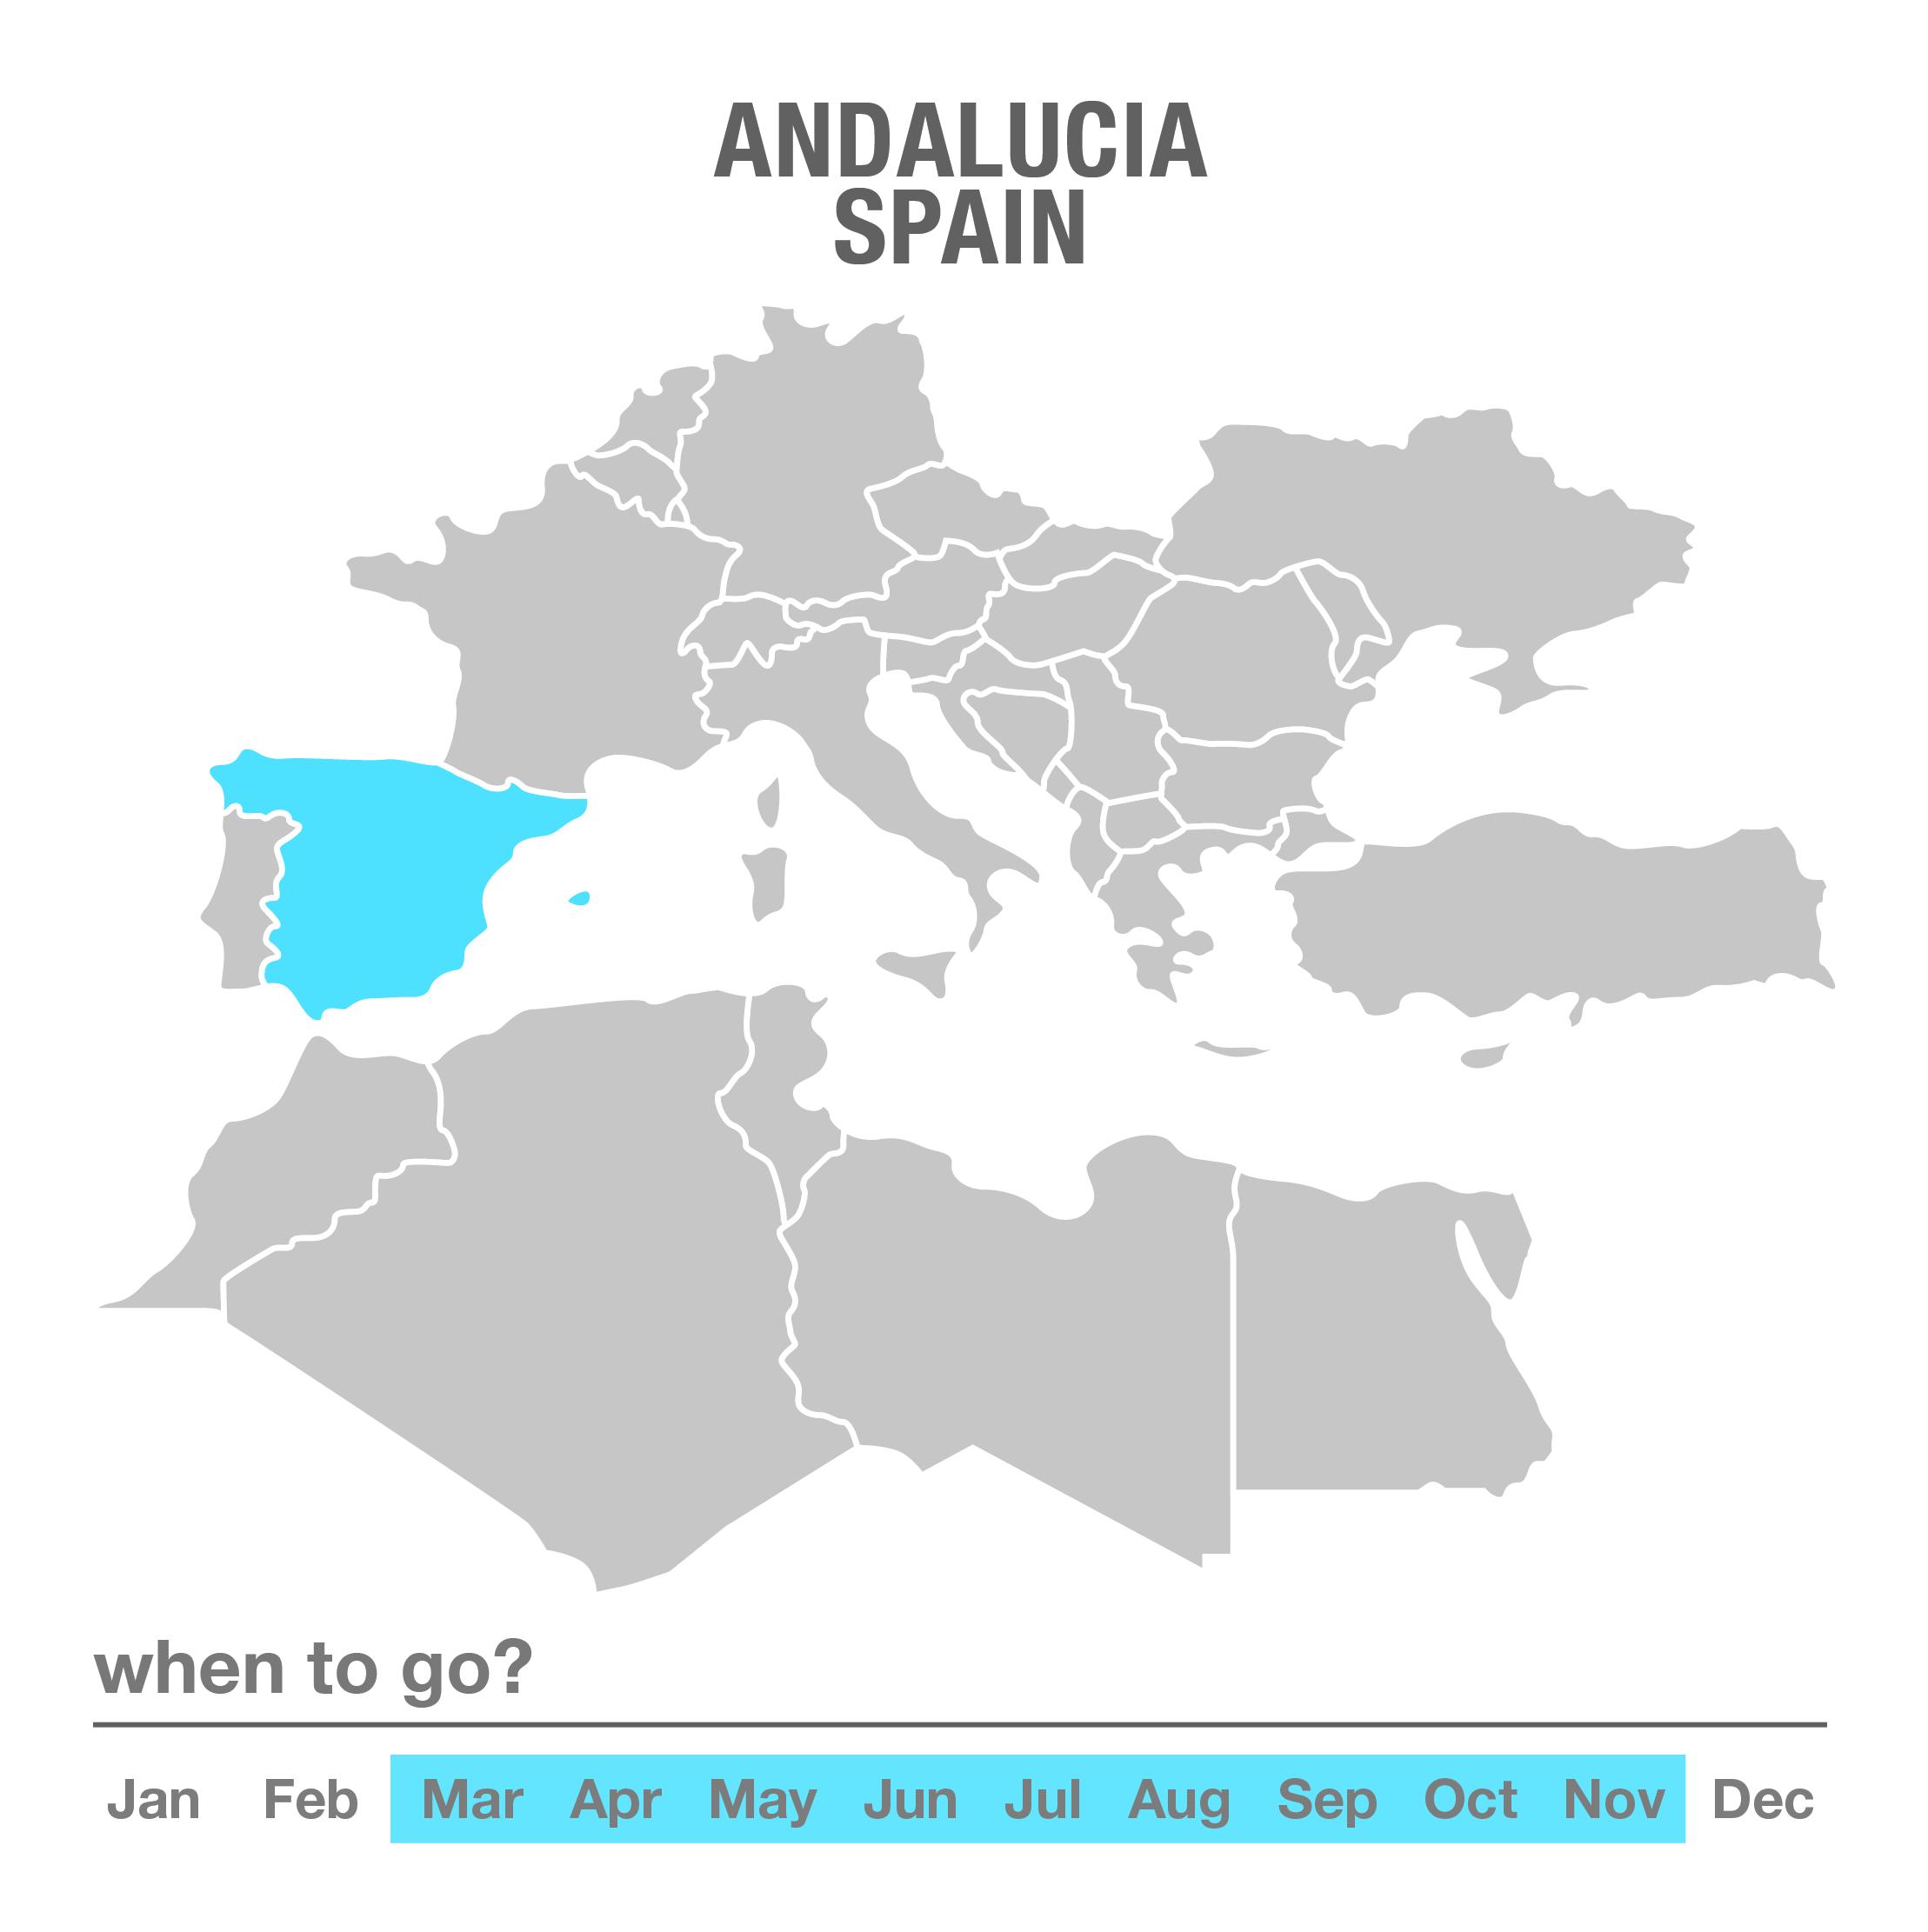 Luxury Tours Andalucía, Spain